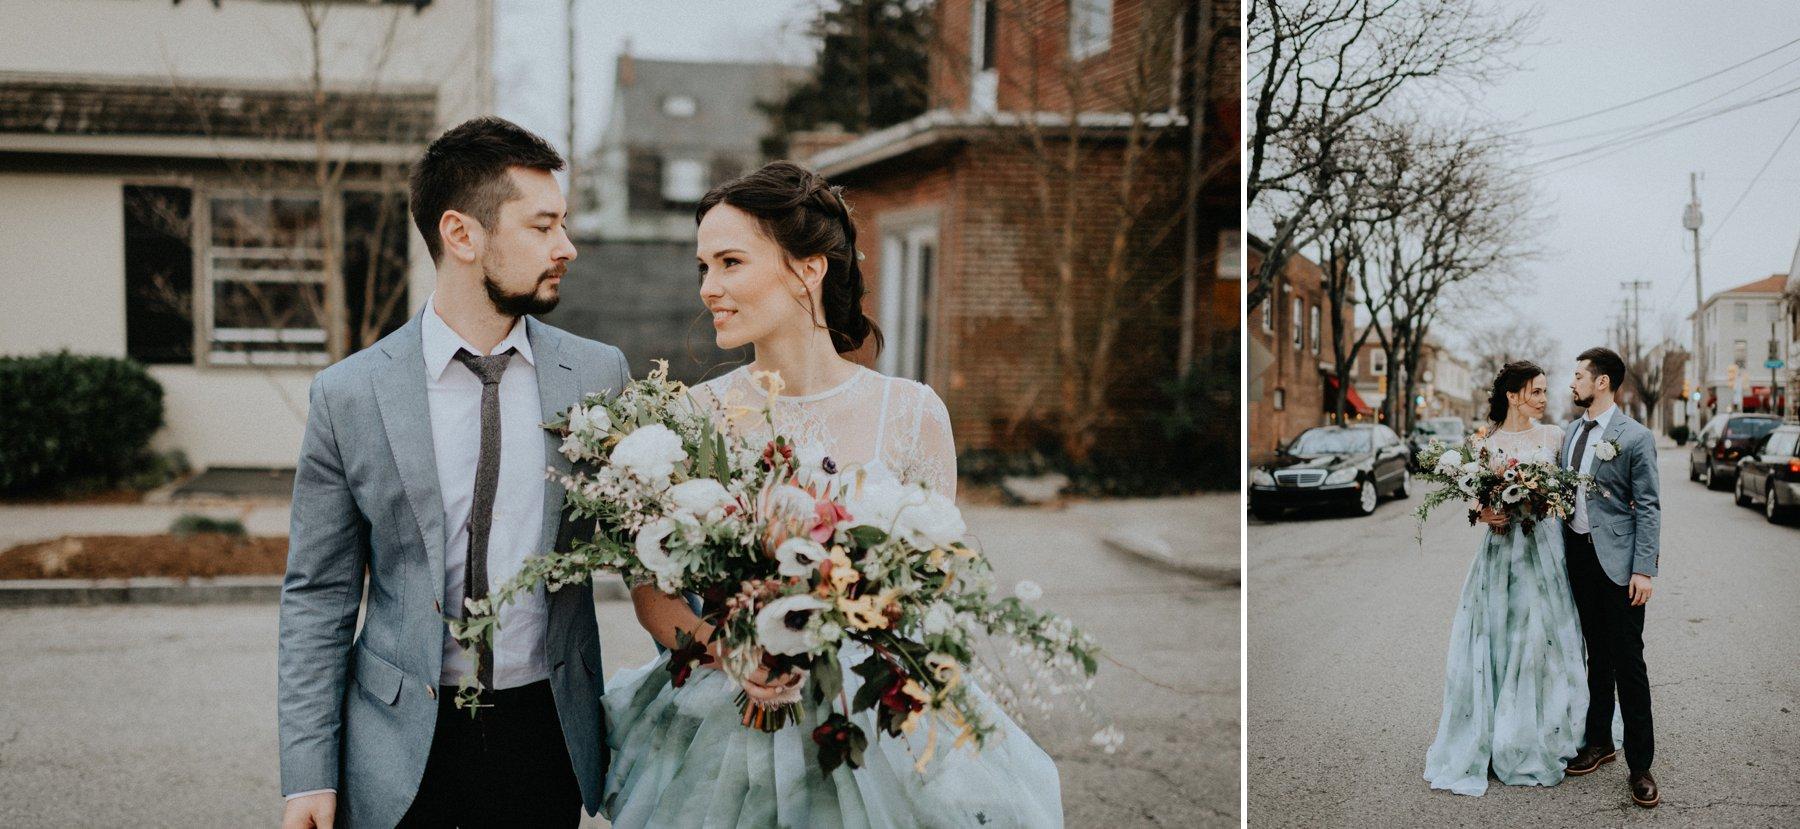 greenhouse-botanical-wedding-56.jpg